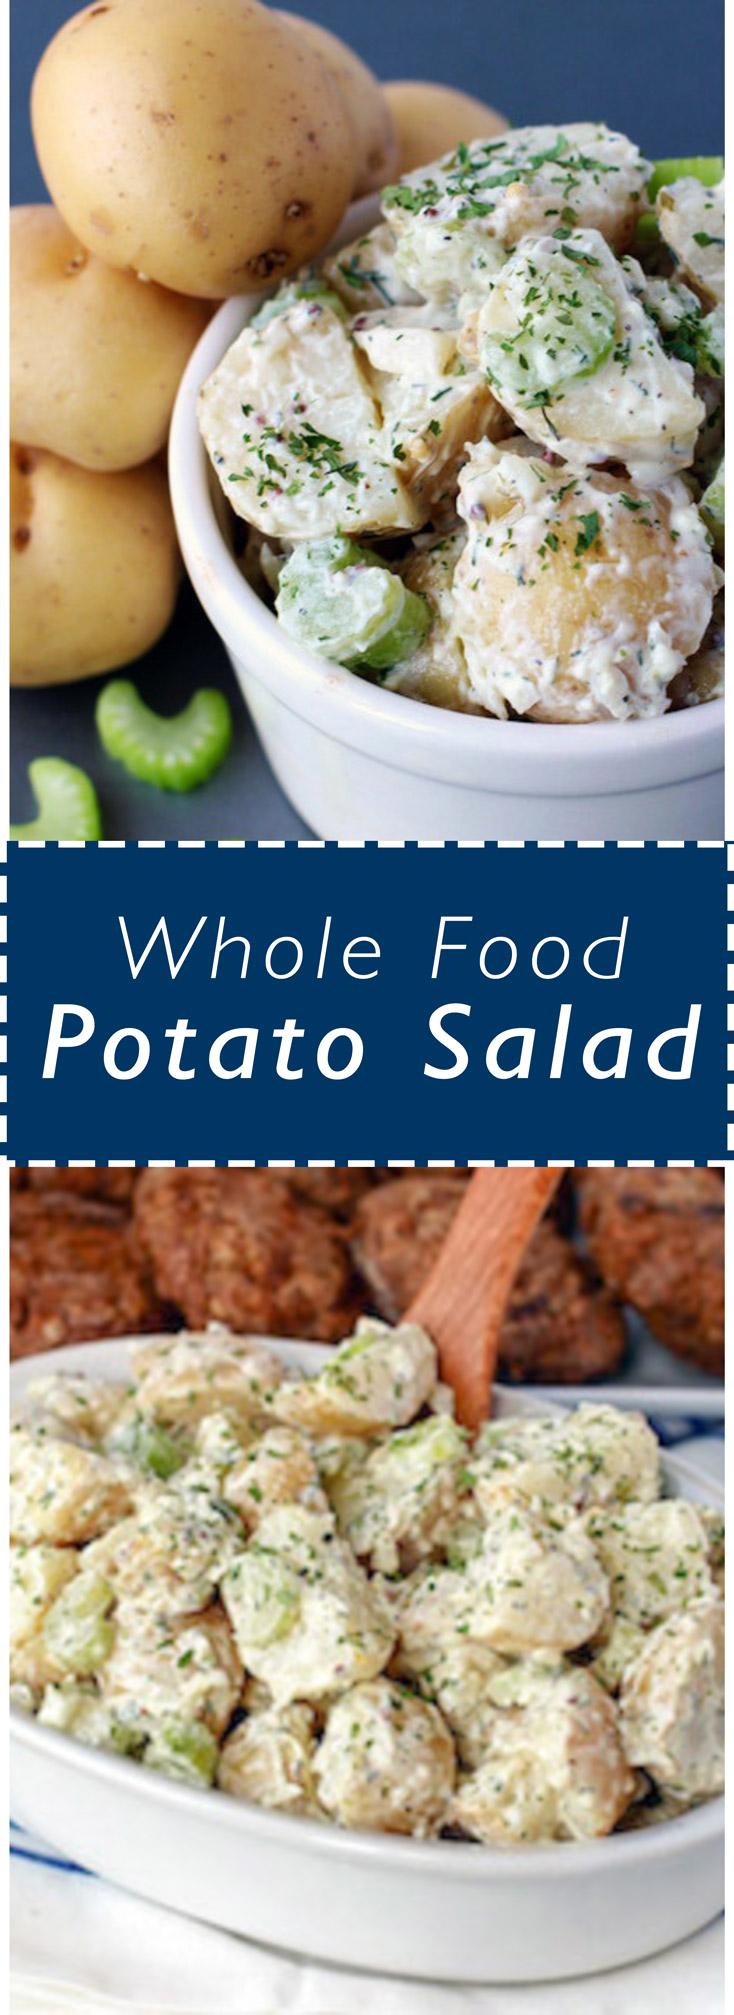 Whole Food Potato Salad